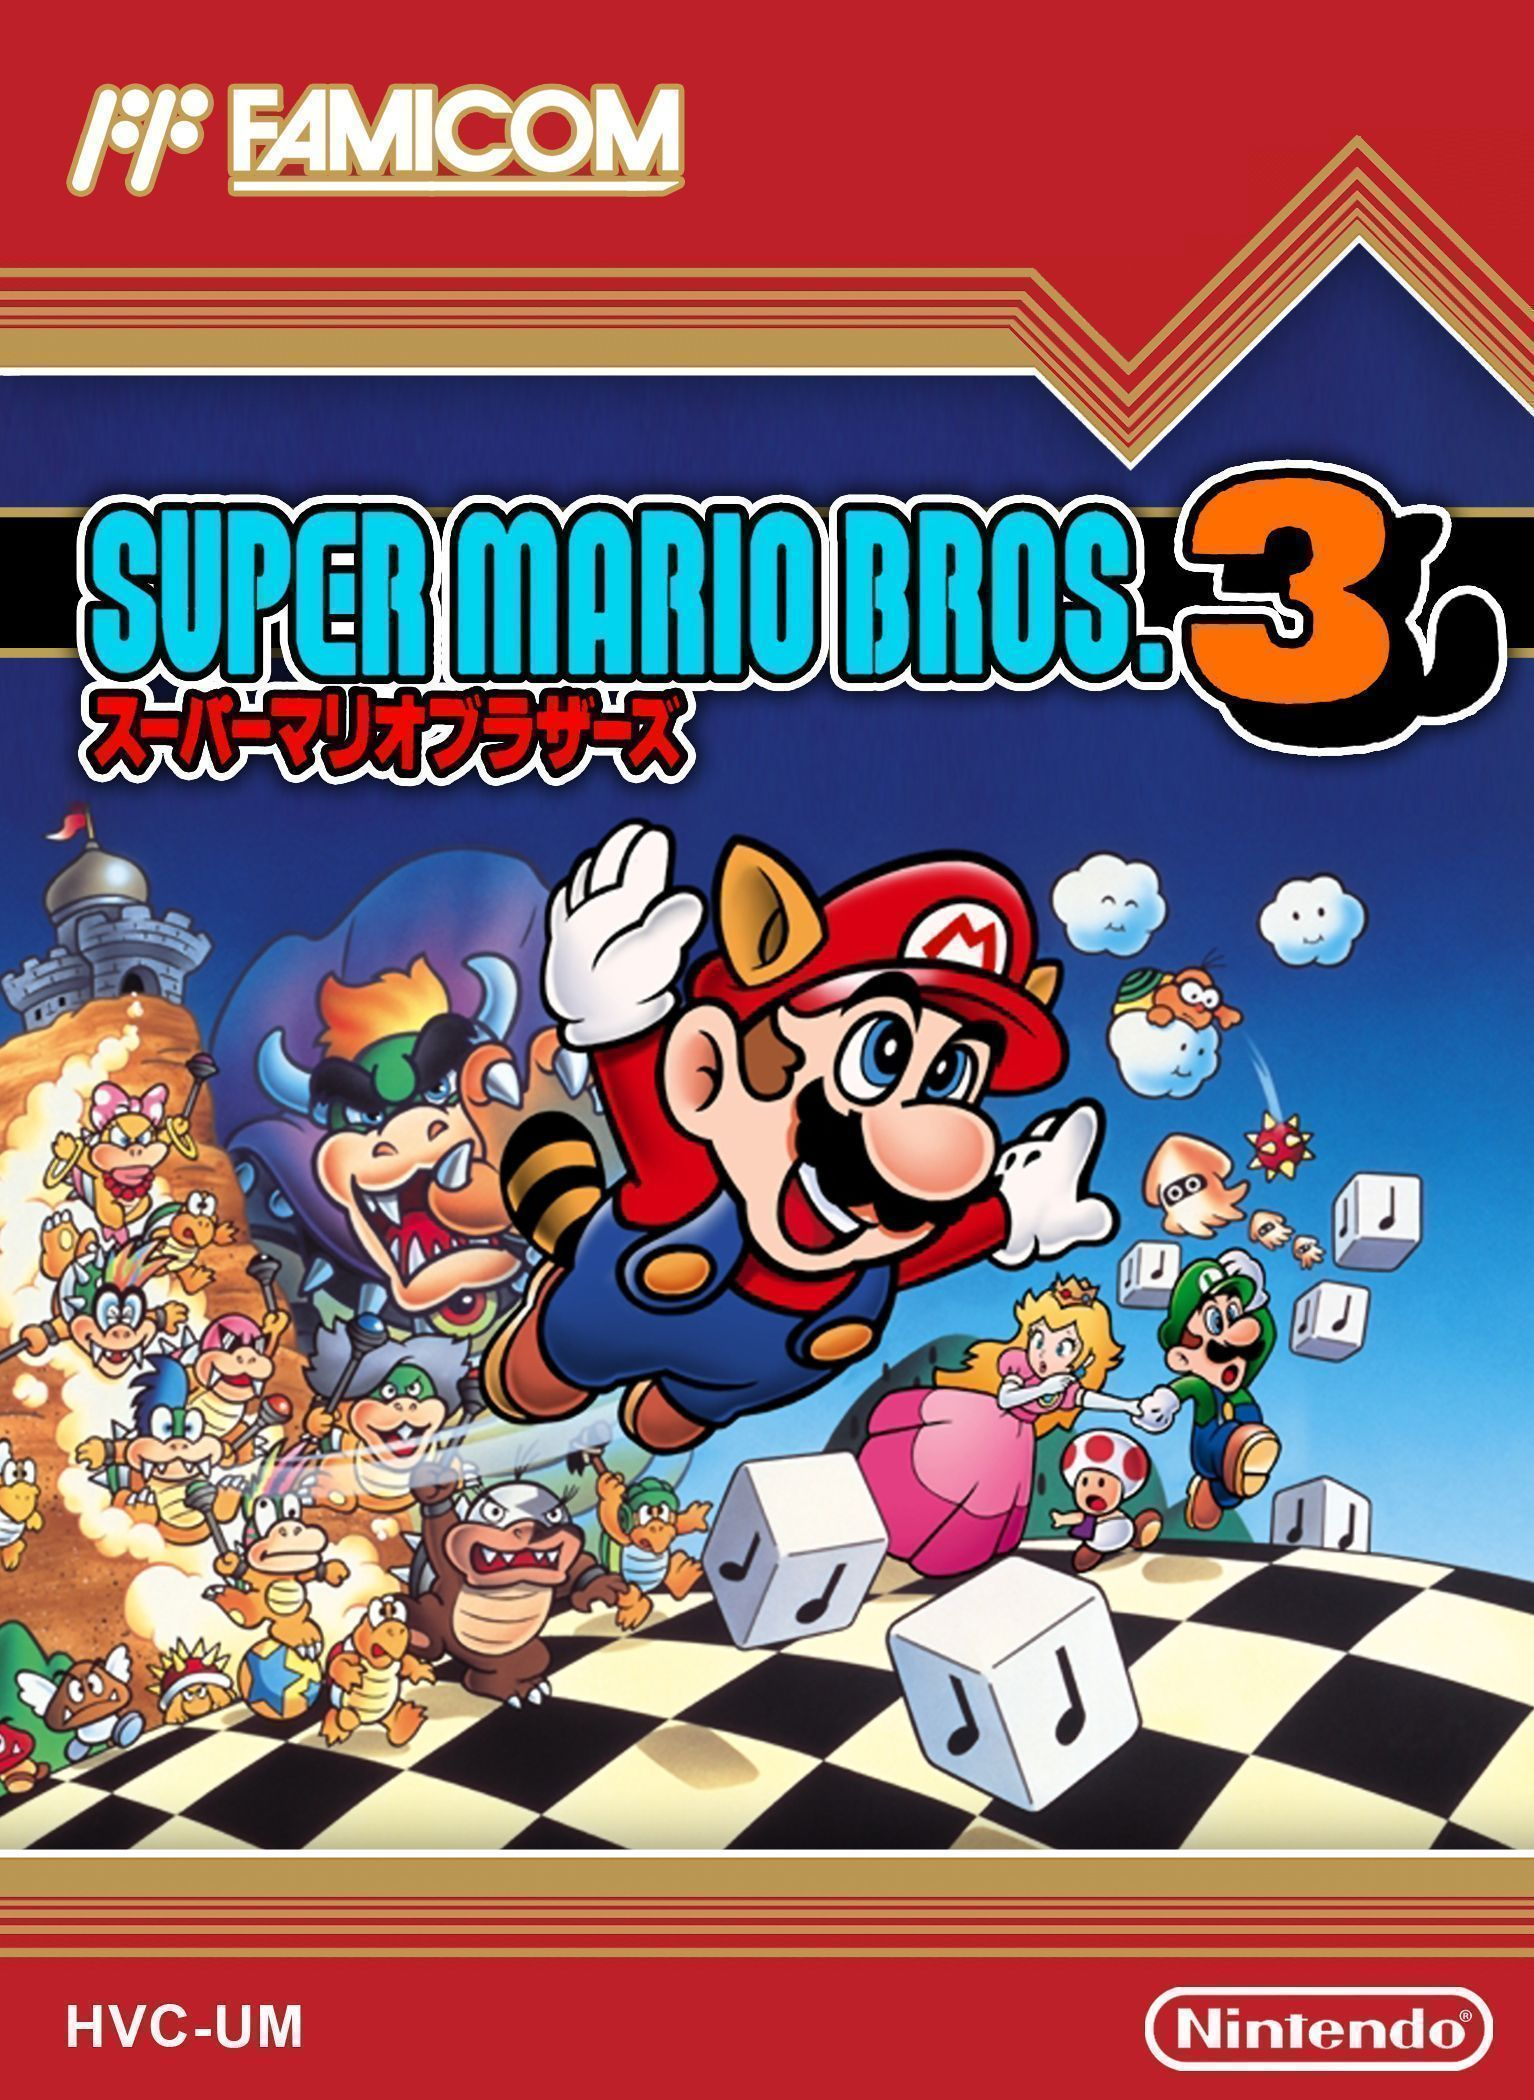 Super Mario Bros 3 Wallpapers Video Game Hq Super Mario Bros 3